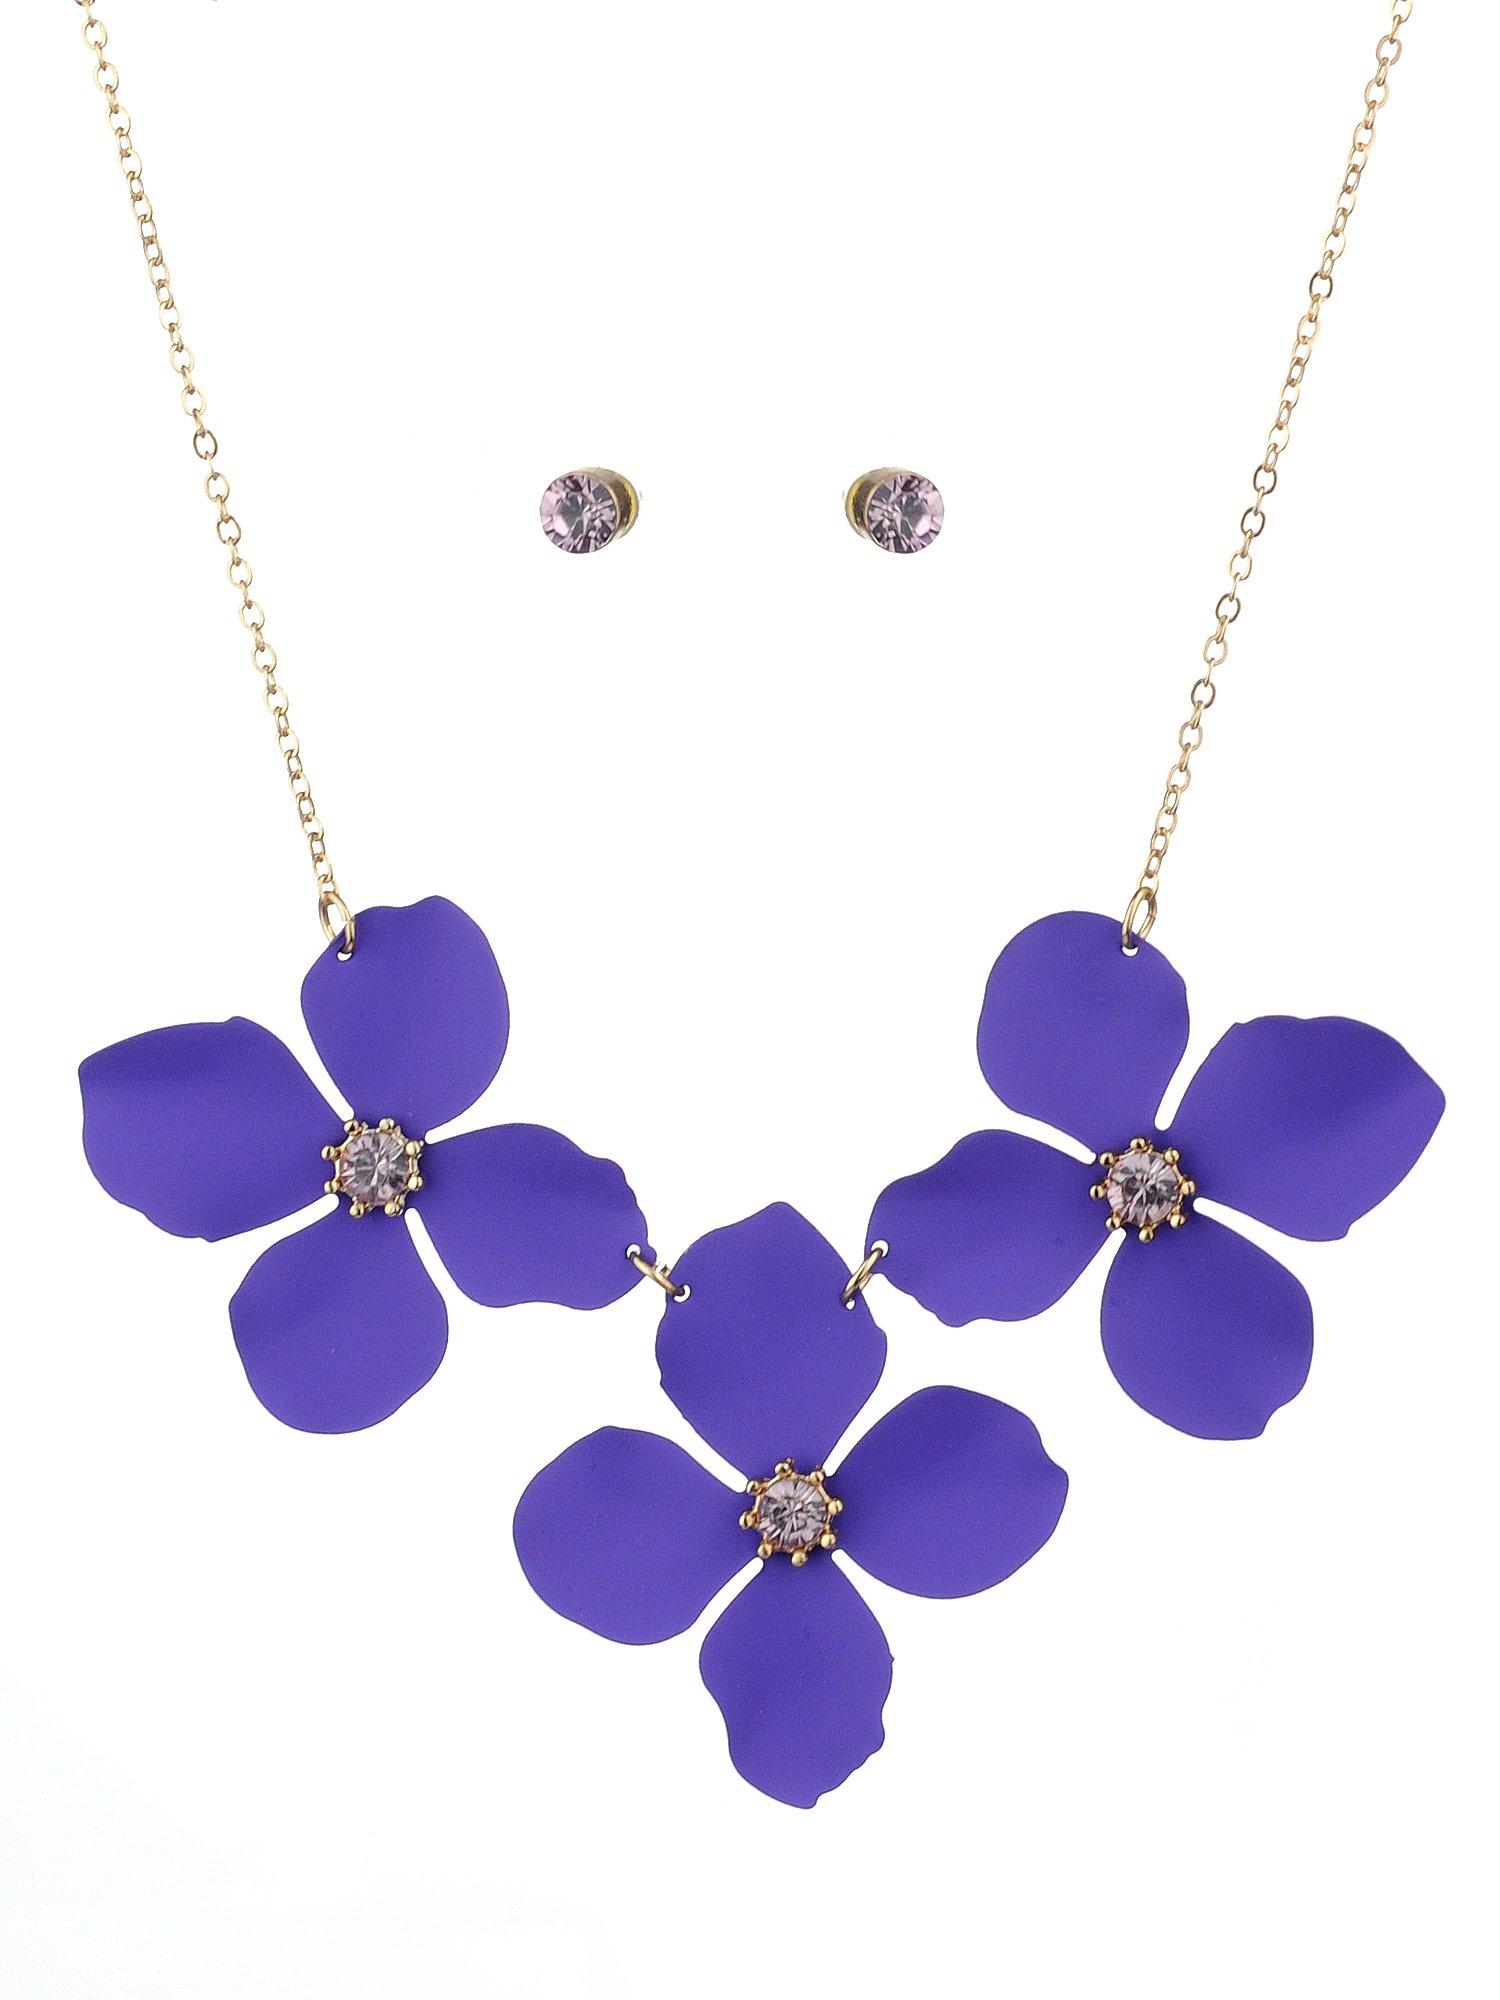 NYFASHION101 Women's Matte Flower Petal Necklace and Stud Earrings Set, Purple